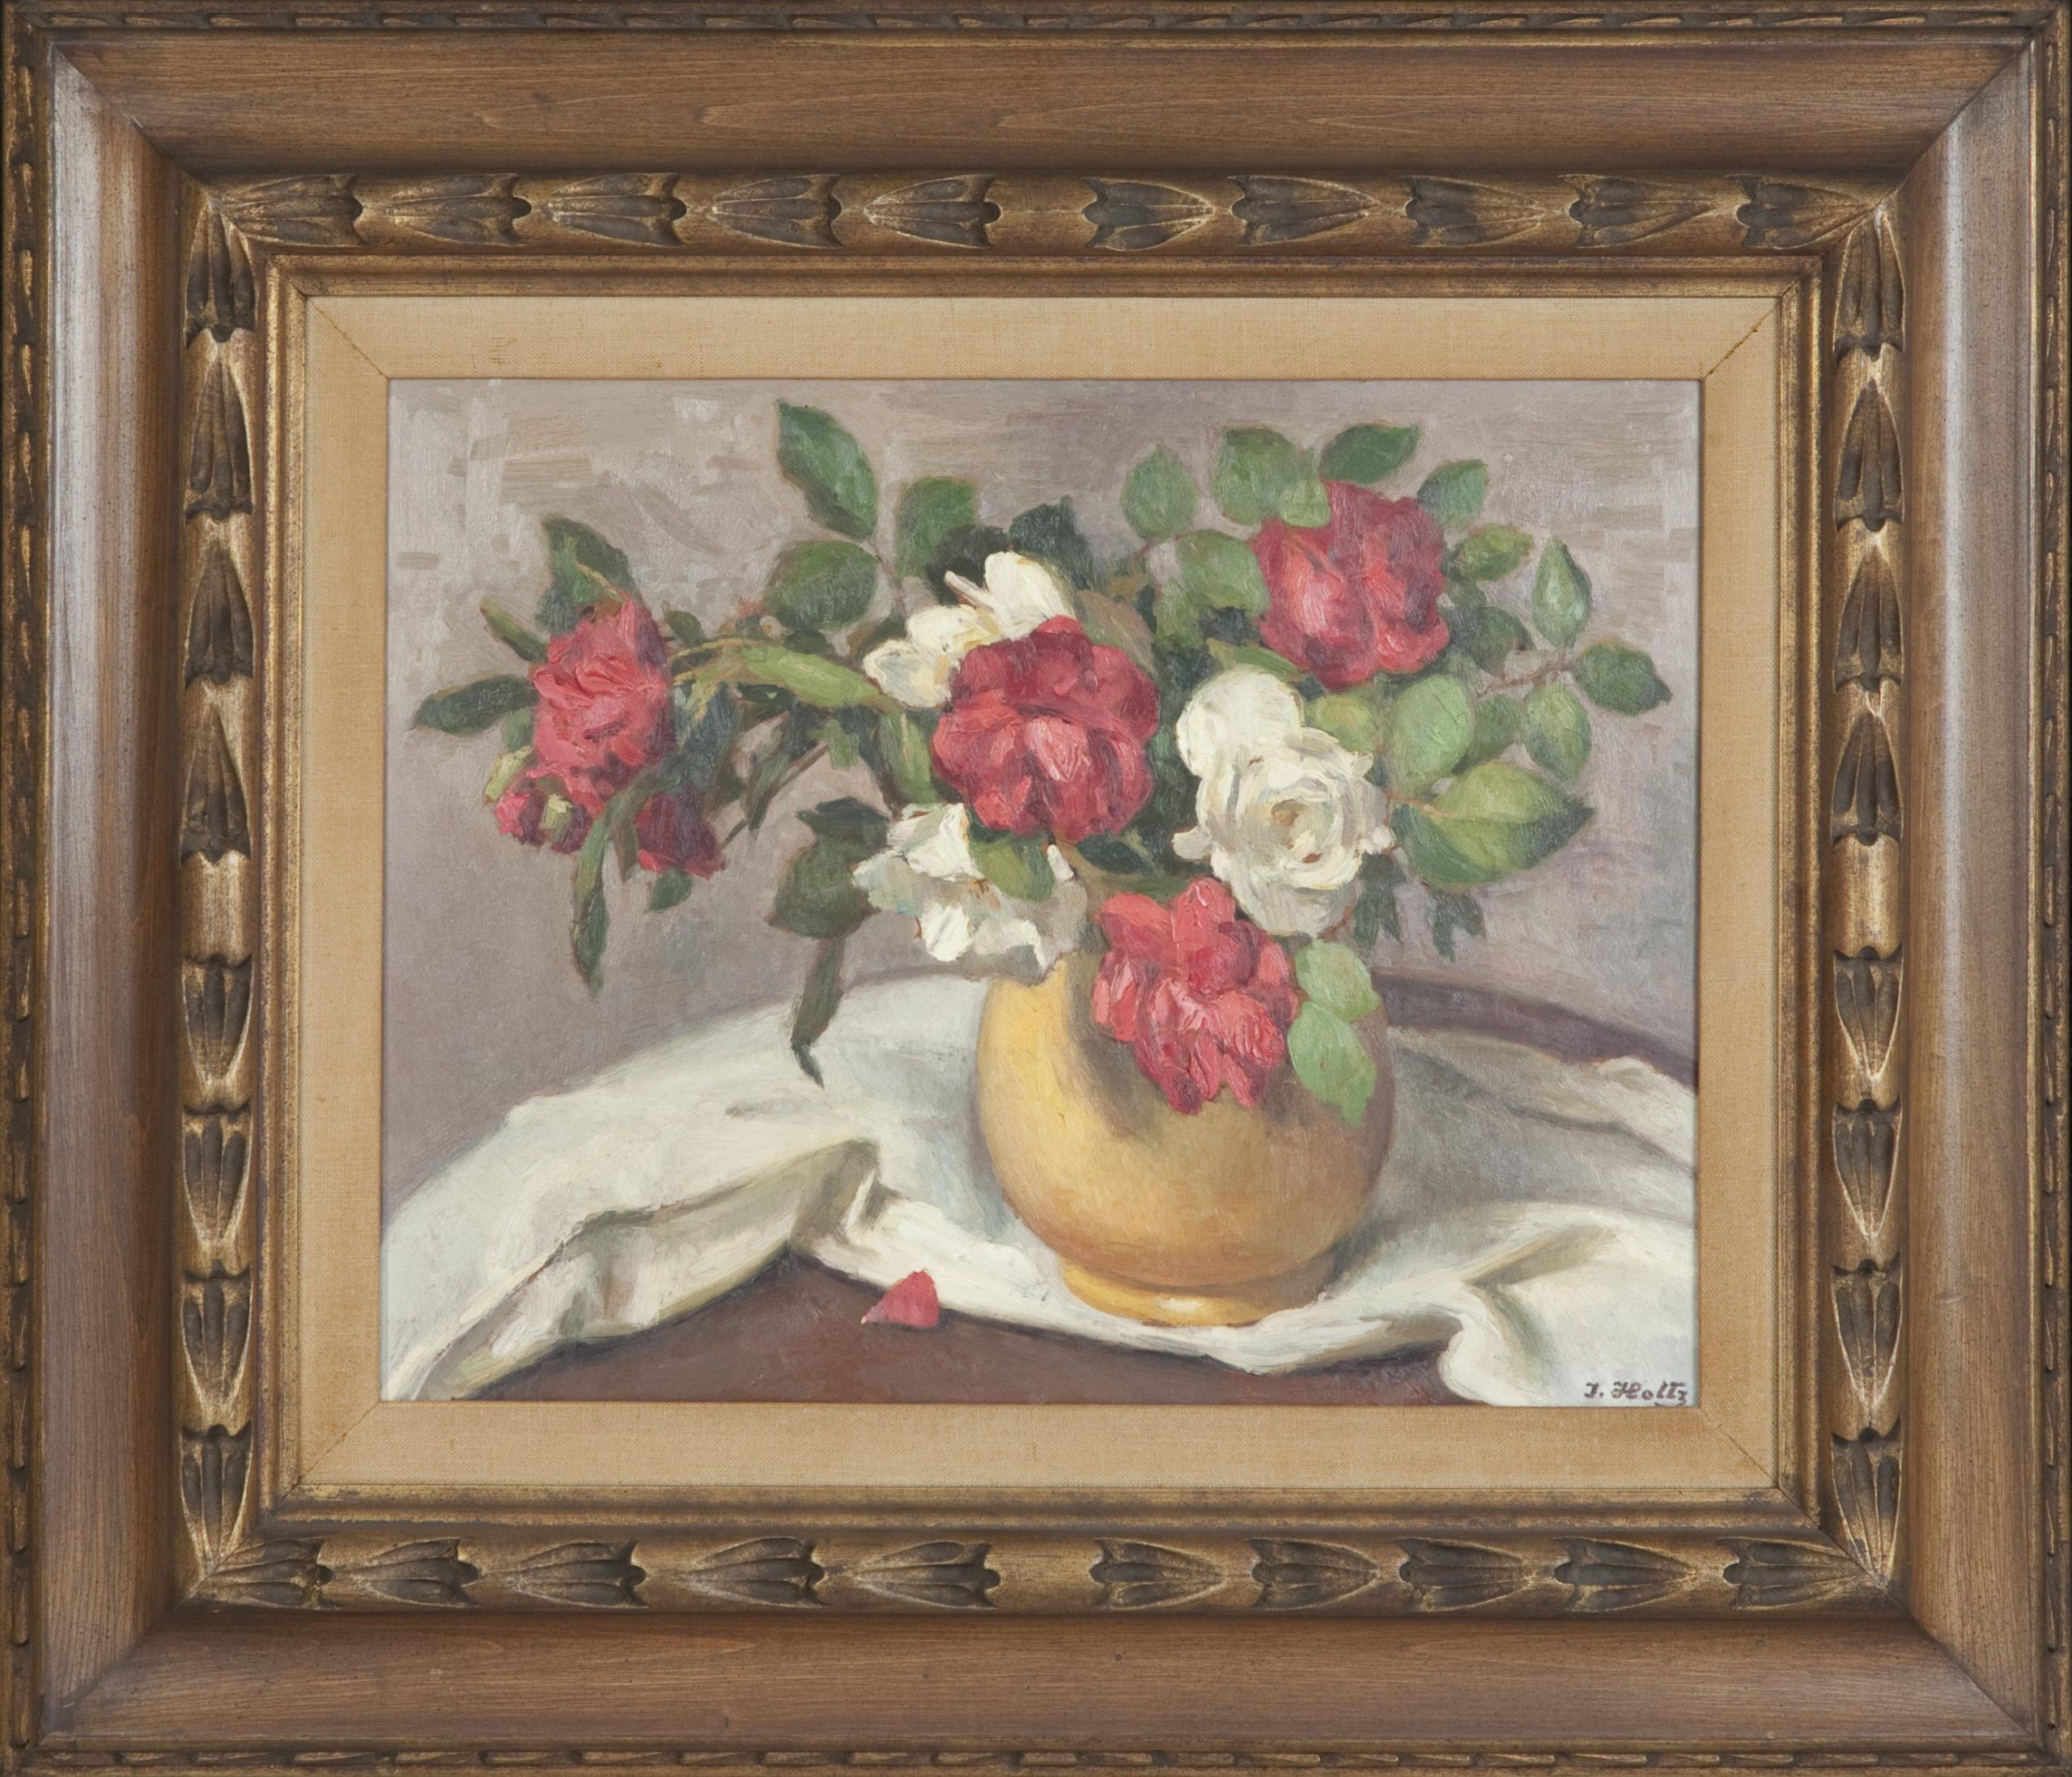 196 Flower Study 1962 - Oil on Masonite - 20.5 x 16.25 - Frame: 27.75 x 23.75 x 2